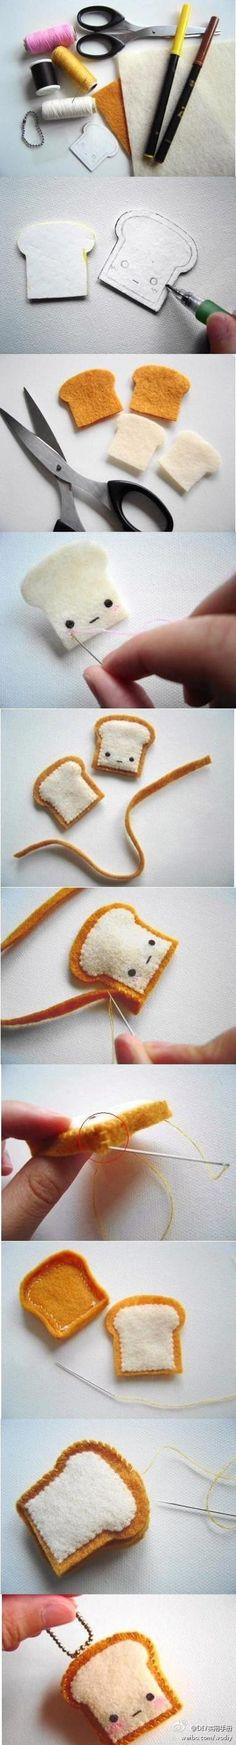 owl【自己动手】DIY可爱羊毛毡土司小挂件